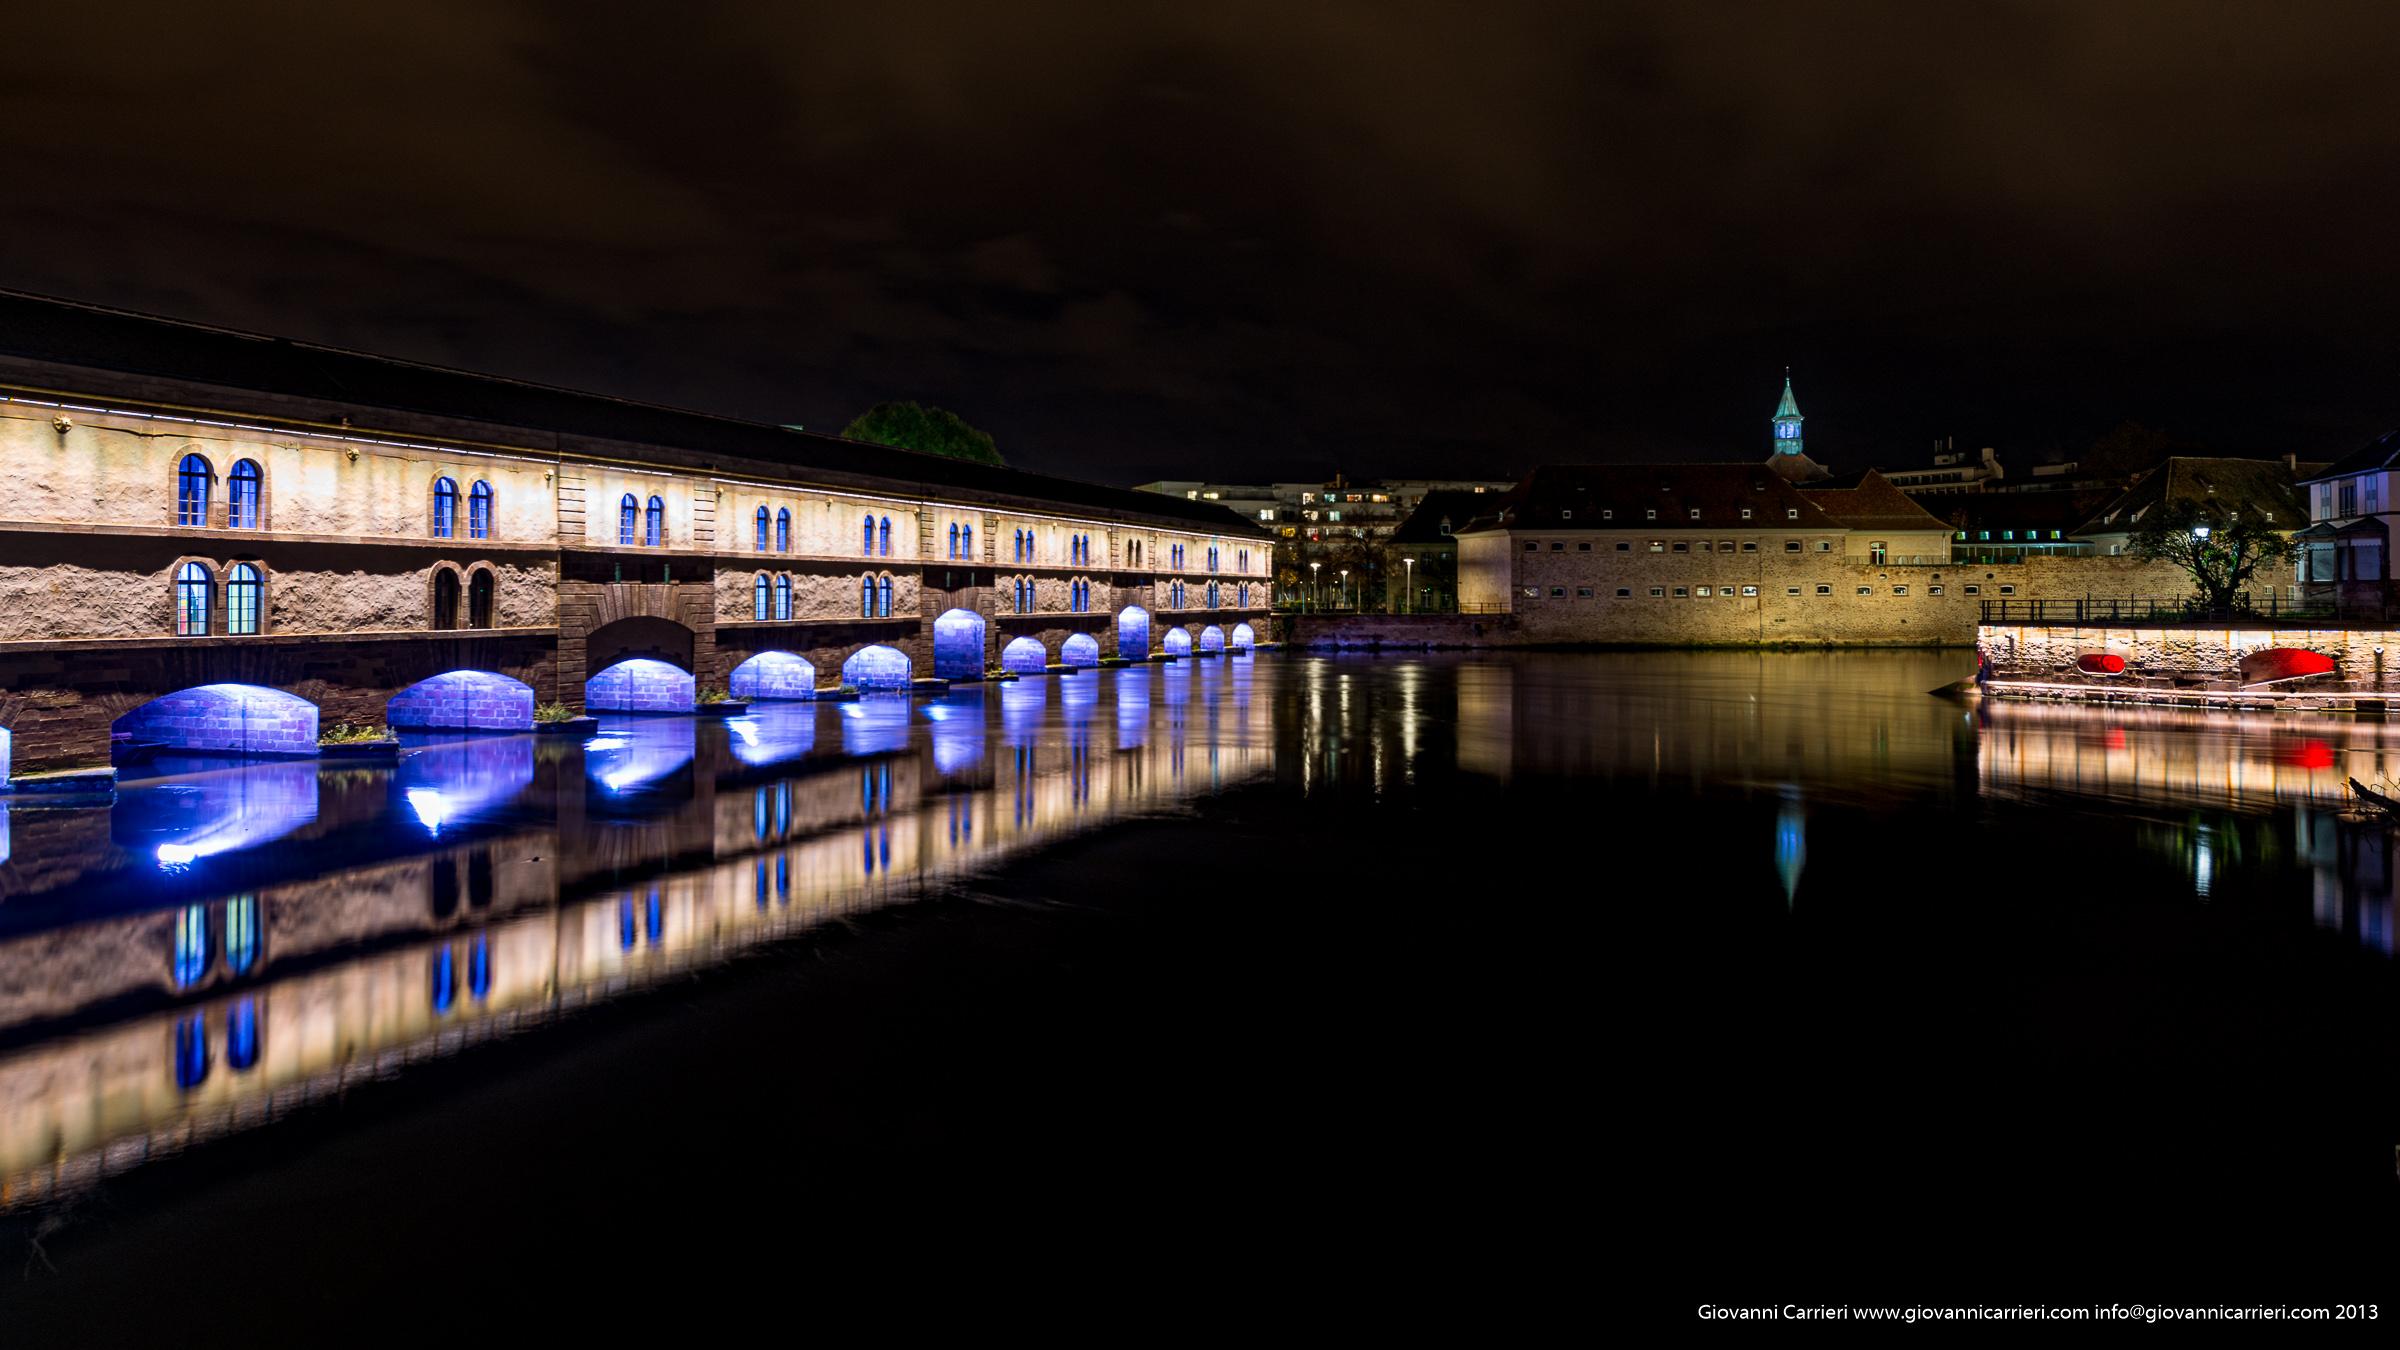 Il ponte coperto - Petite France - Strasburgo